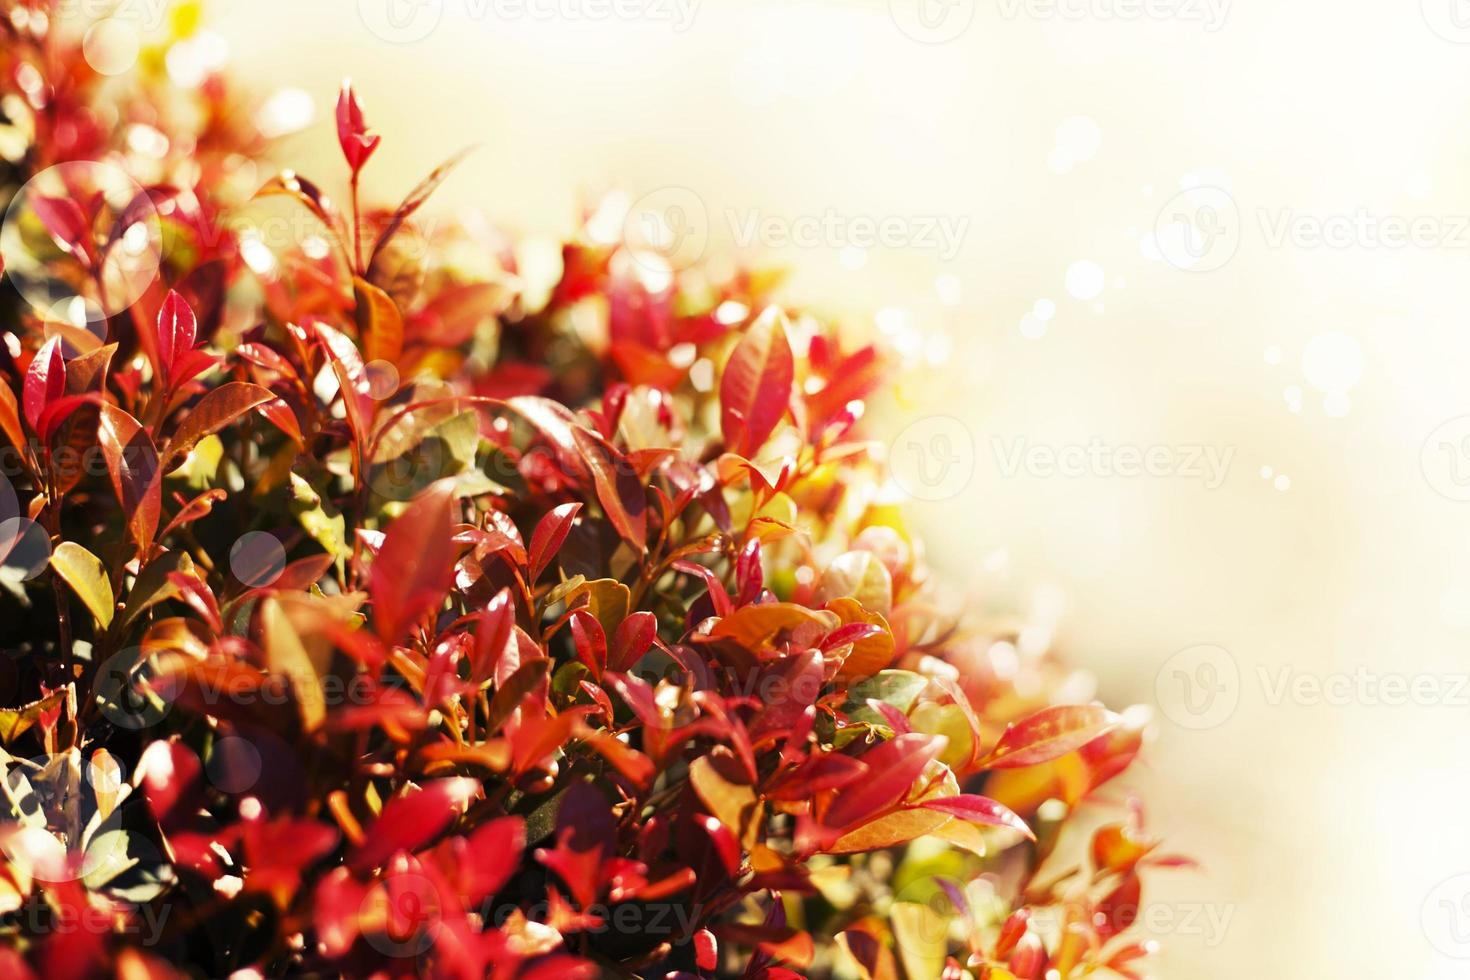 fundo de folhas de outono amarelas, foco muito raso, macro fotografia foto